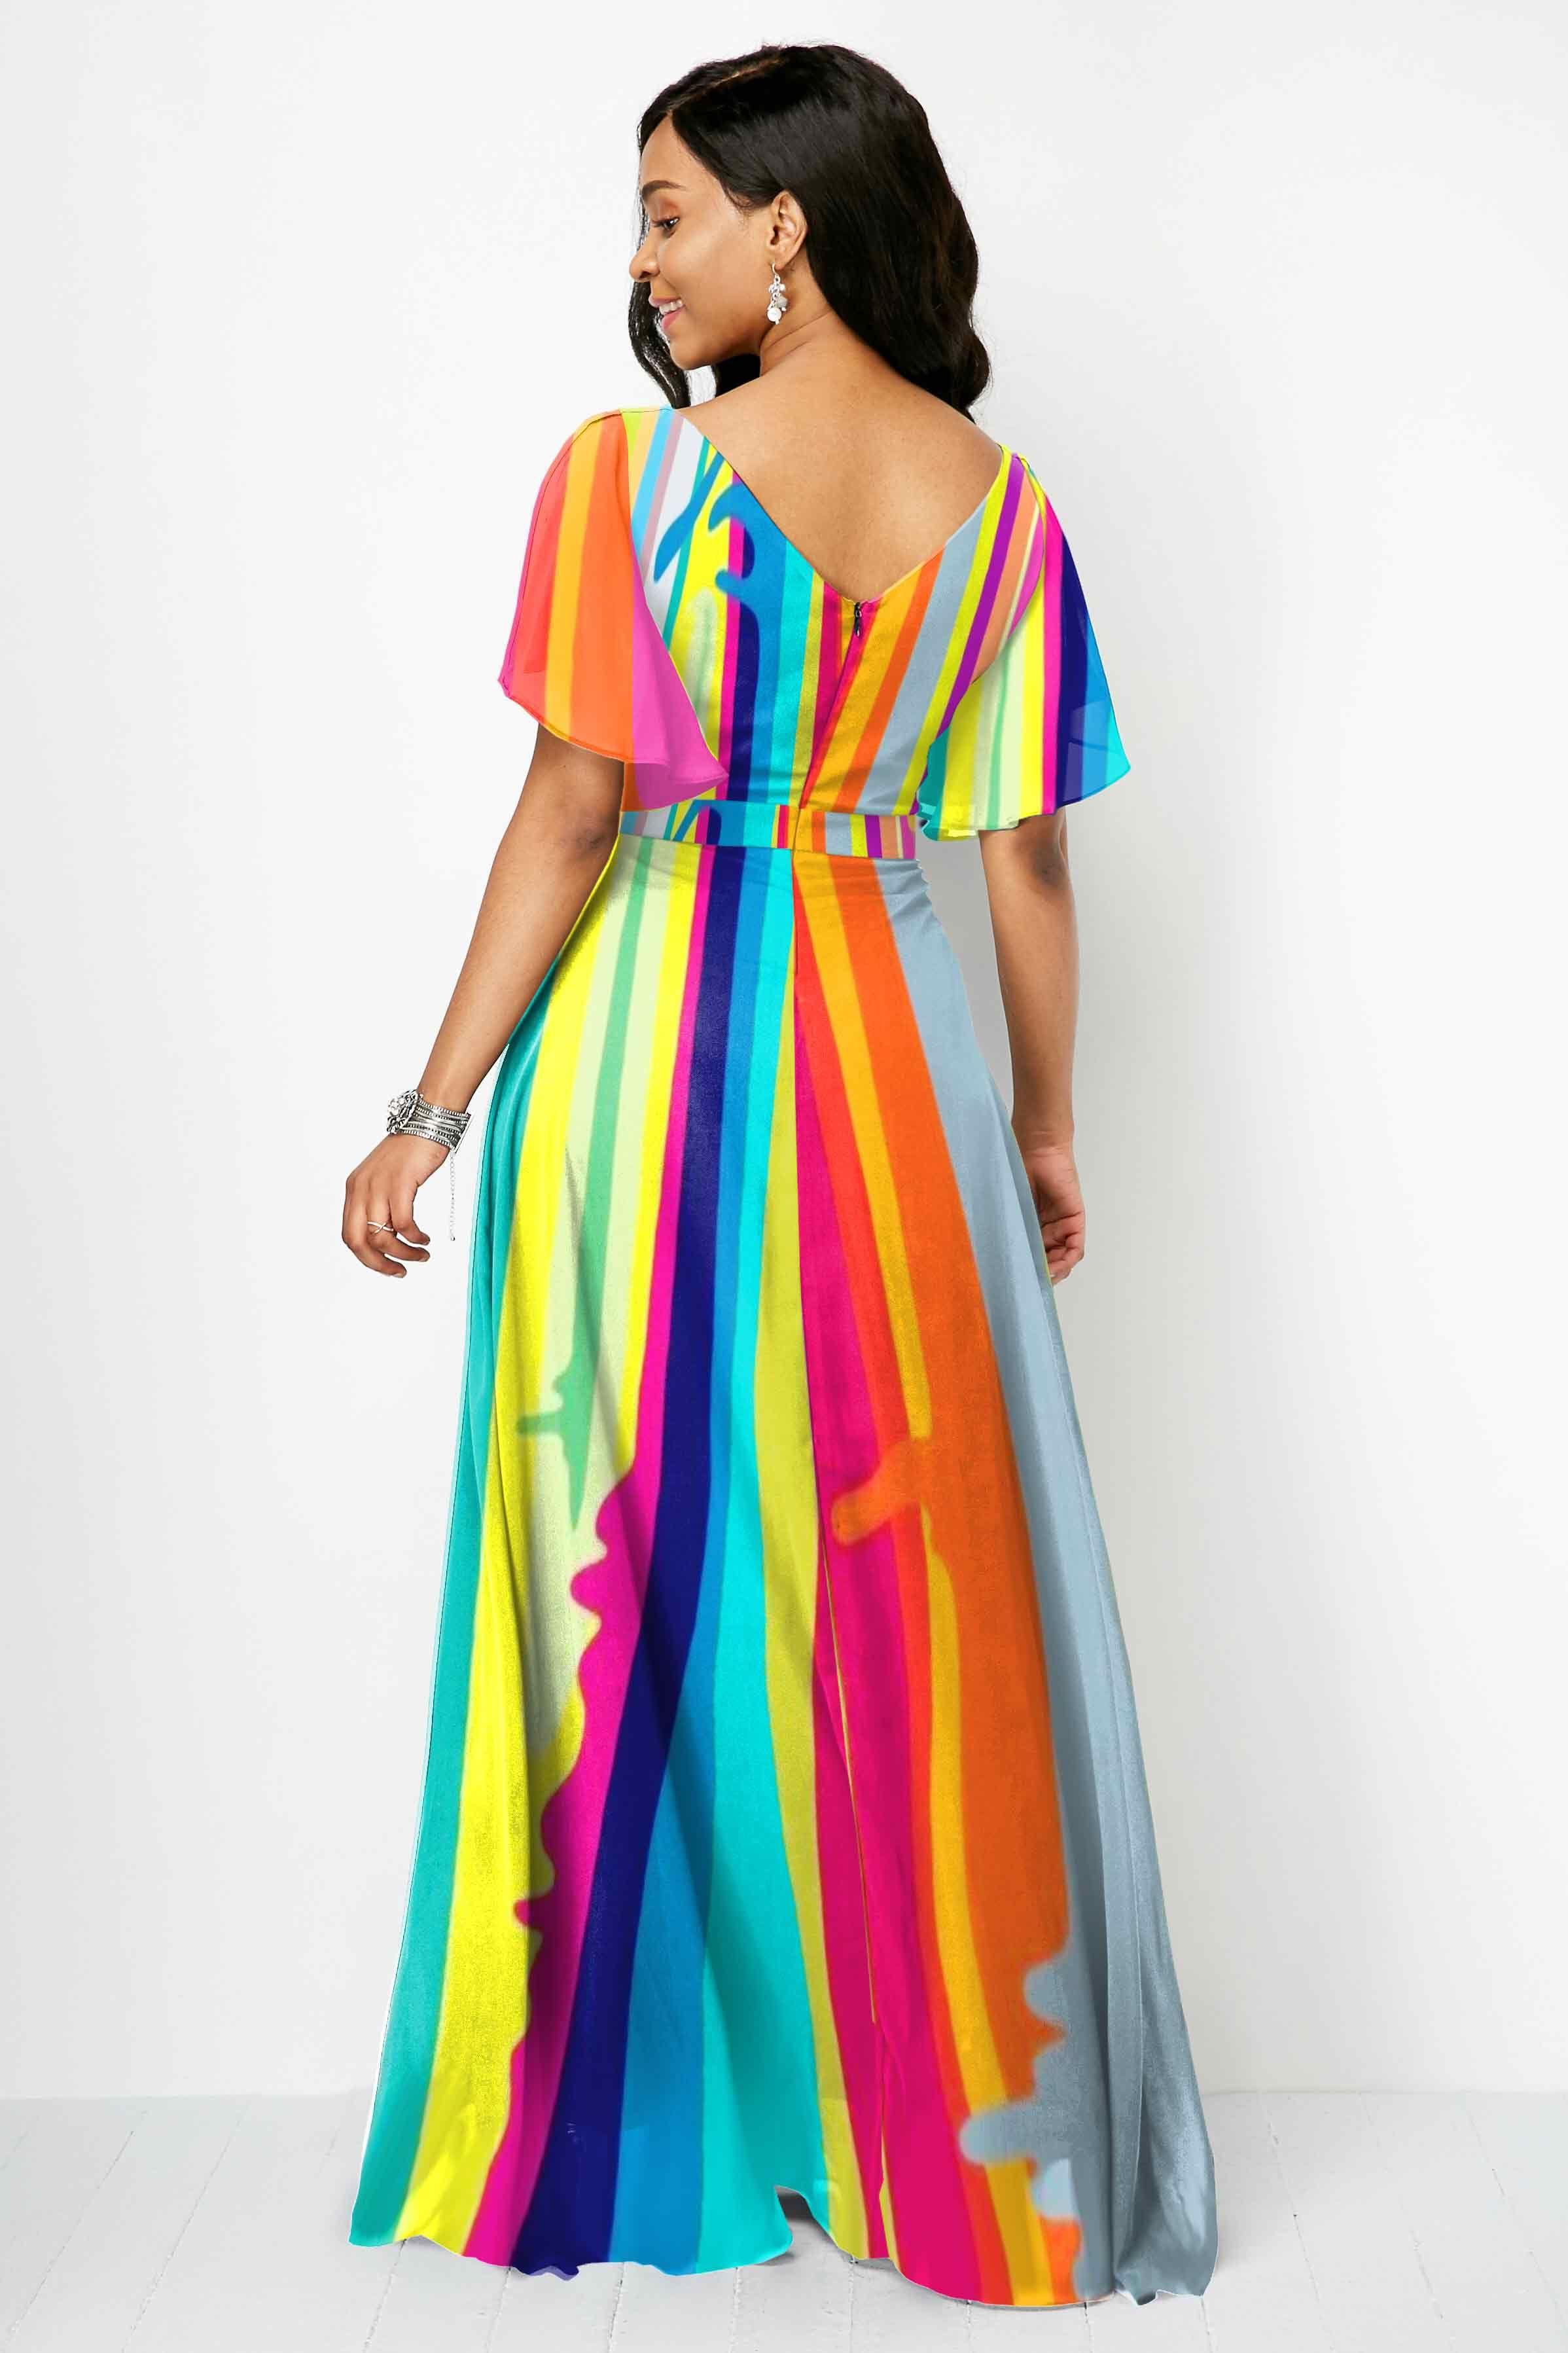 V Neck Multi Color Rainbow Striped Maxi Dress Ad Color Multi Neck Casual Dresses For Women Dresses Rainbow Dress [ 3595 x 2396 Pixel ]